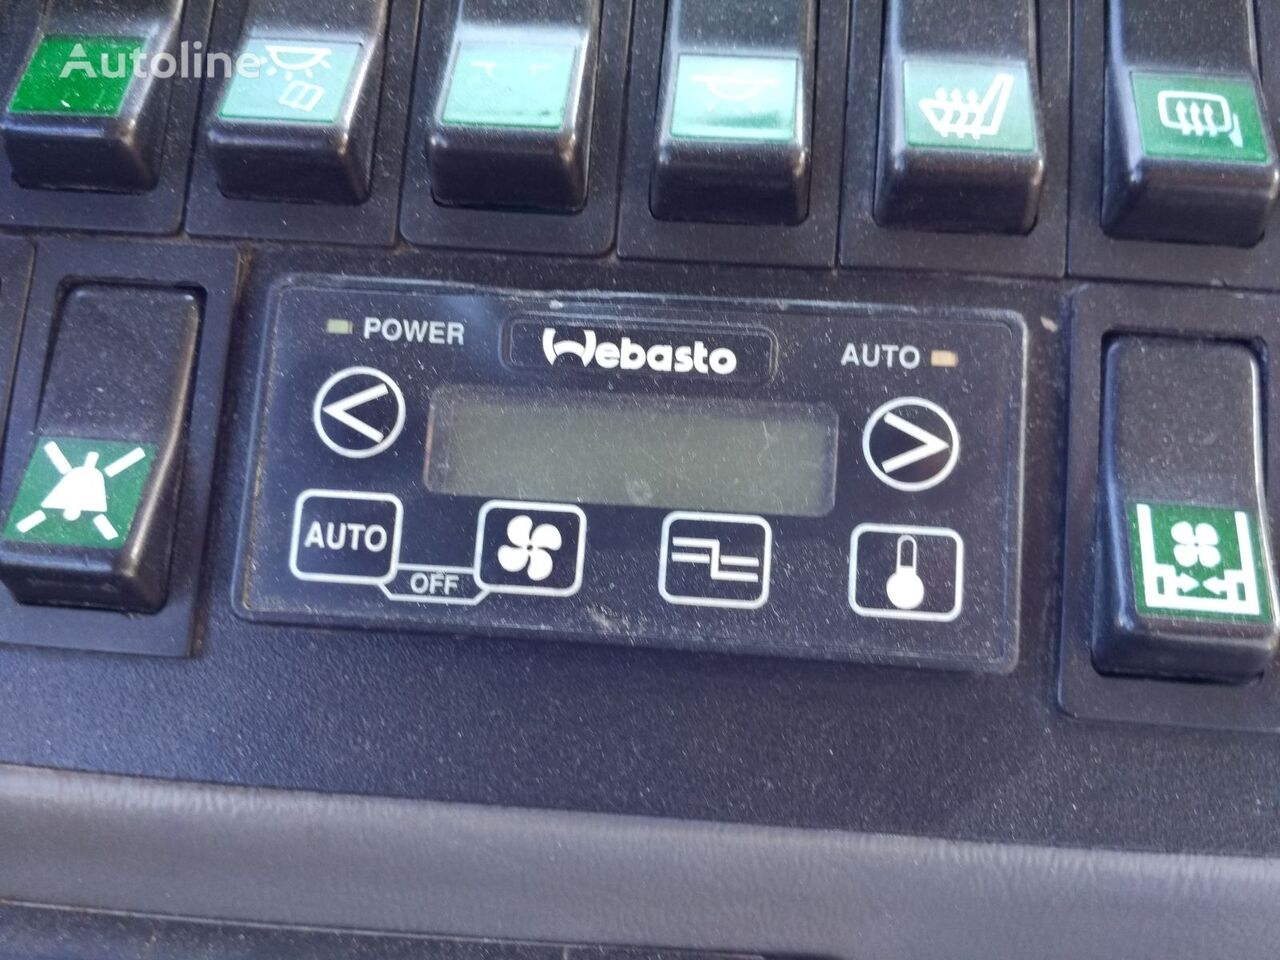 unidad de control Webasto klimat kontrolem para autobús